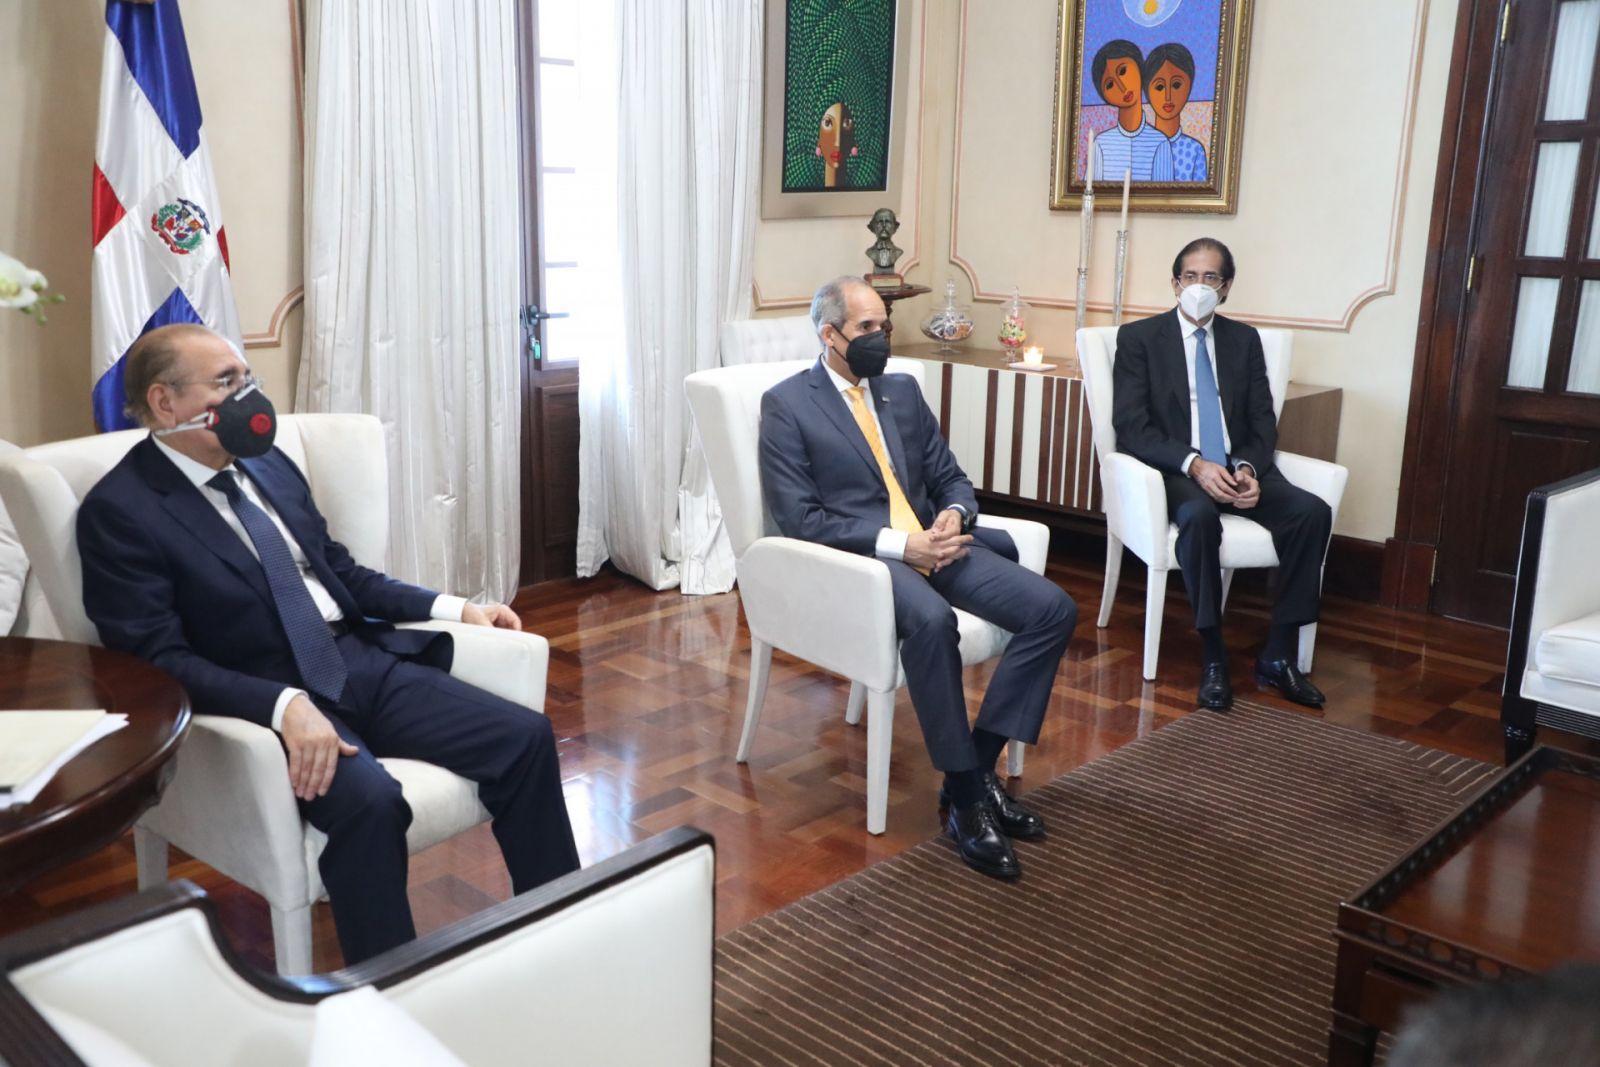 Video | Junta Directiva de ASIEX felicita al presidente Danilo Medina por adecuado manejo de la pandemia